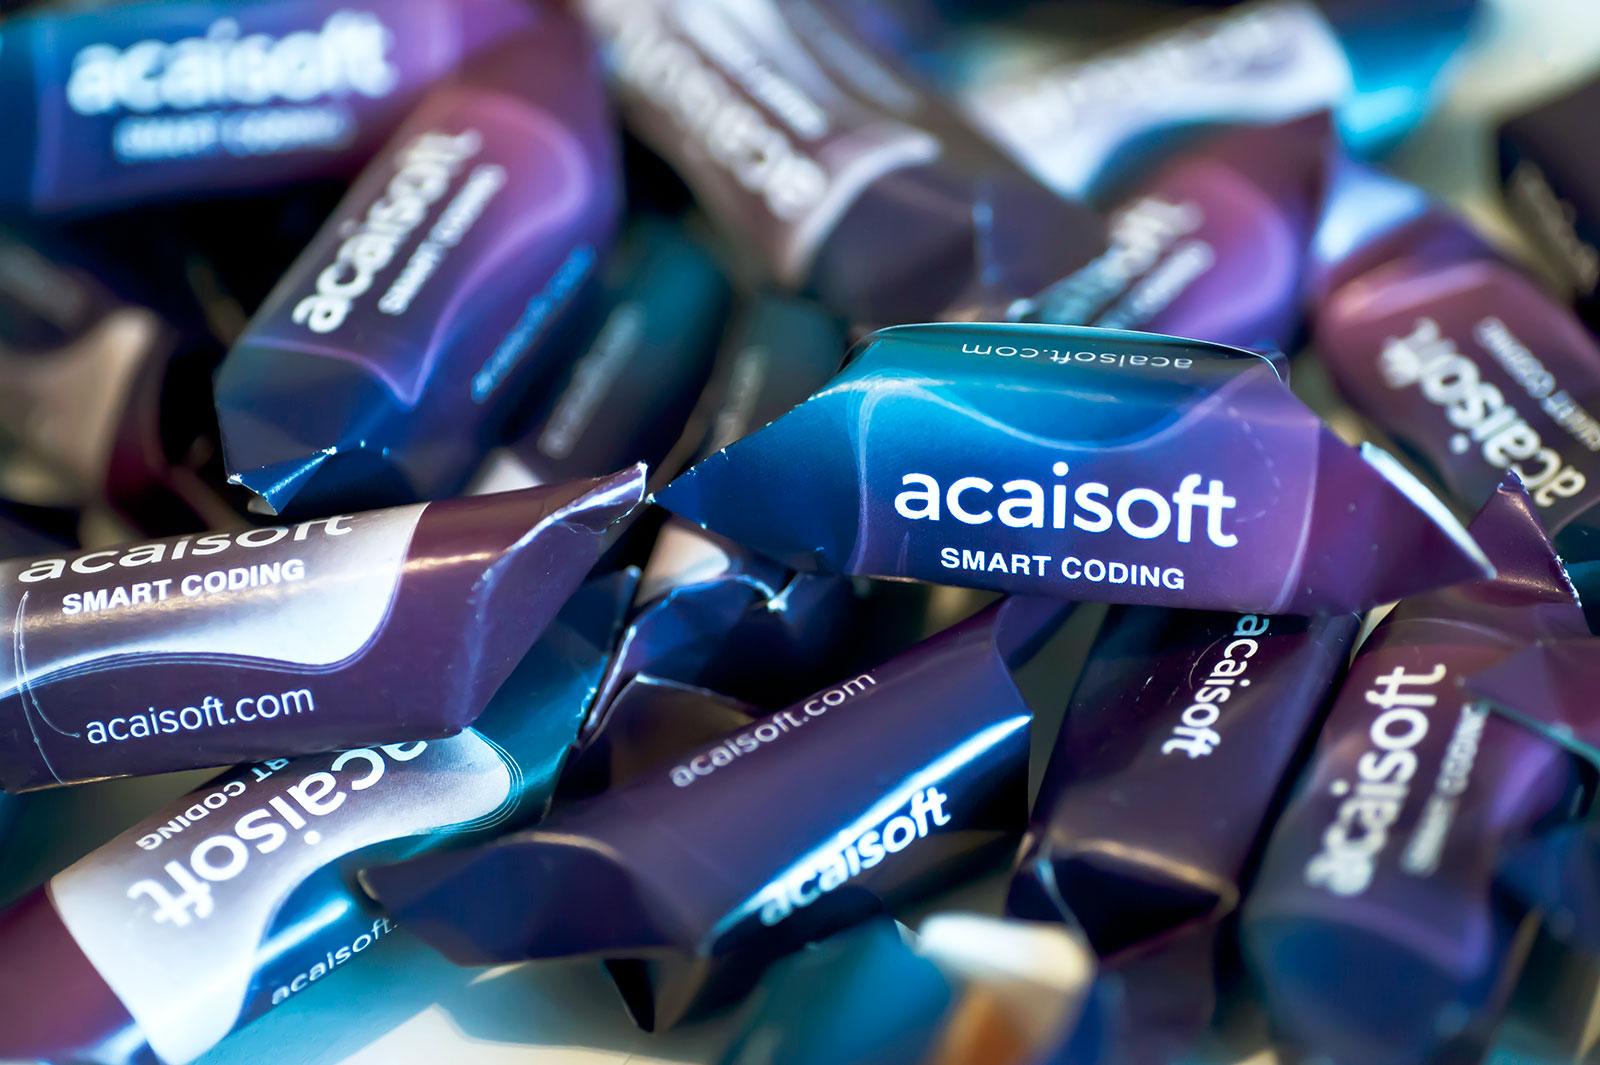 acaisoft-rebranding-na-ng-poland-2016-1